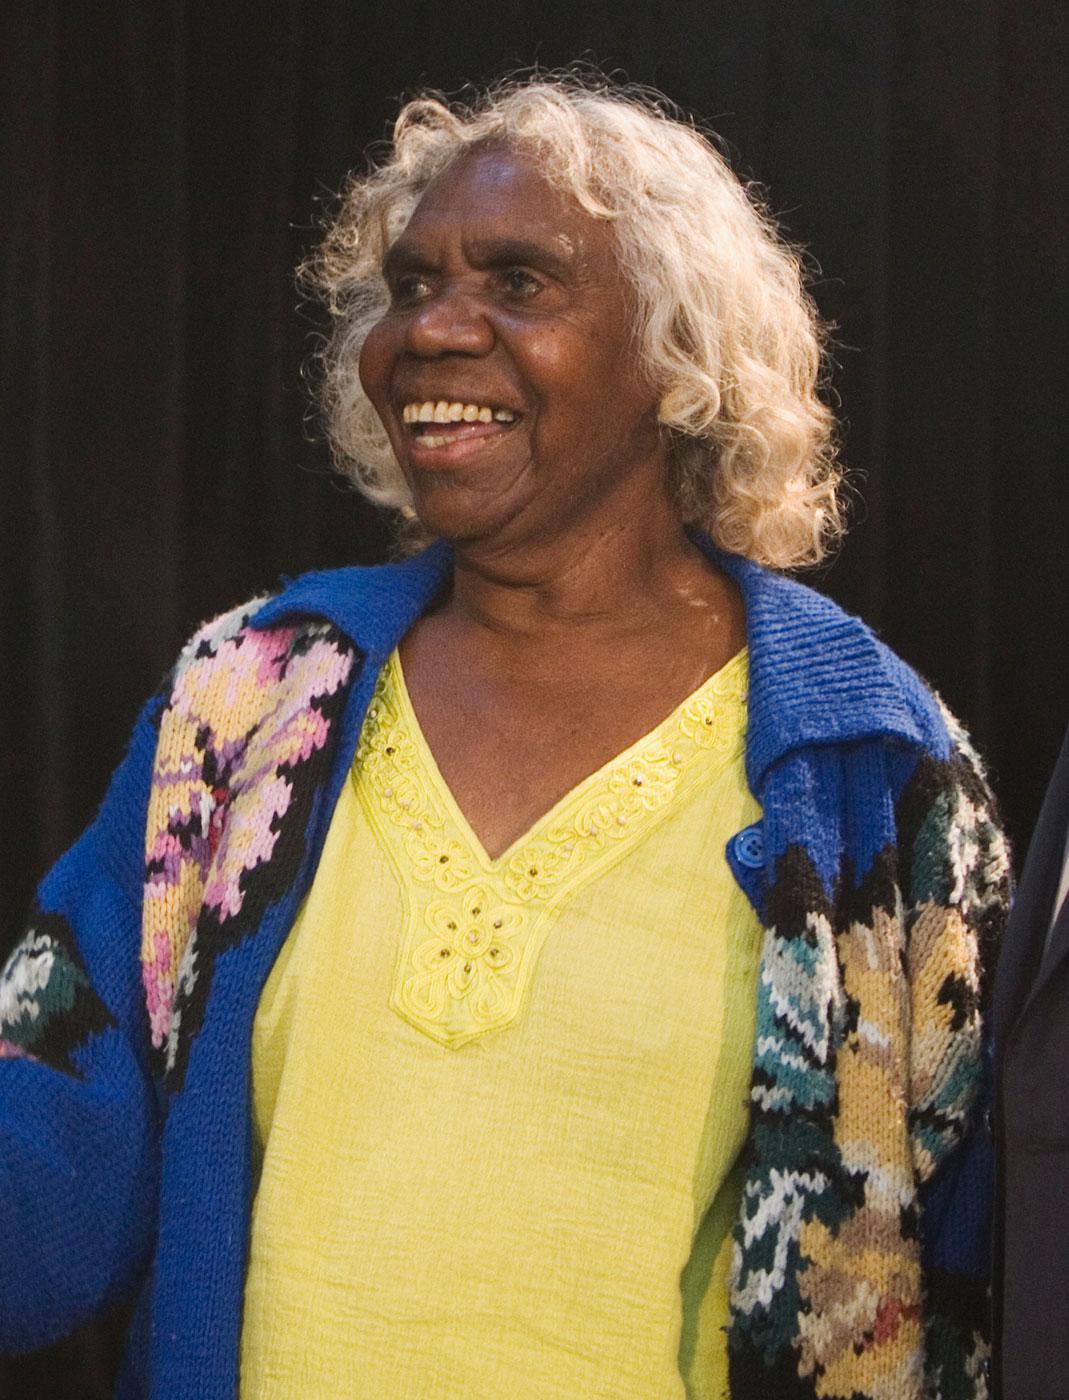 Portrait photo of an Aboriginal Australian woman.